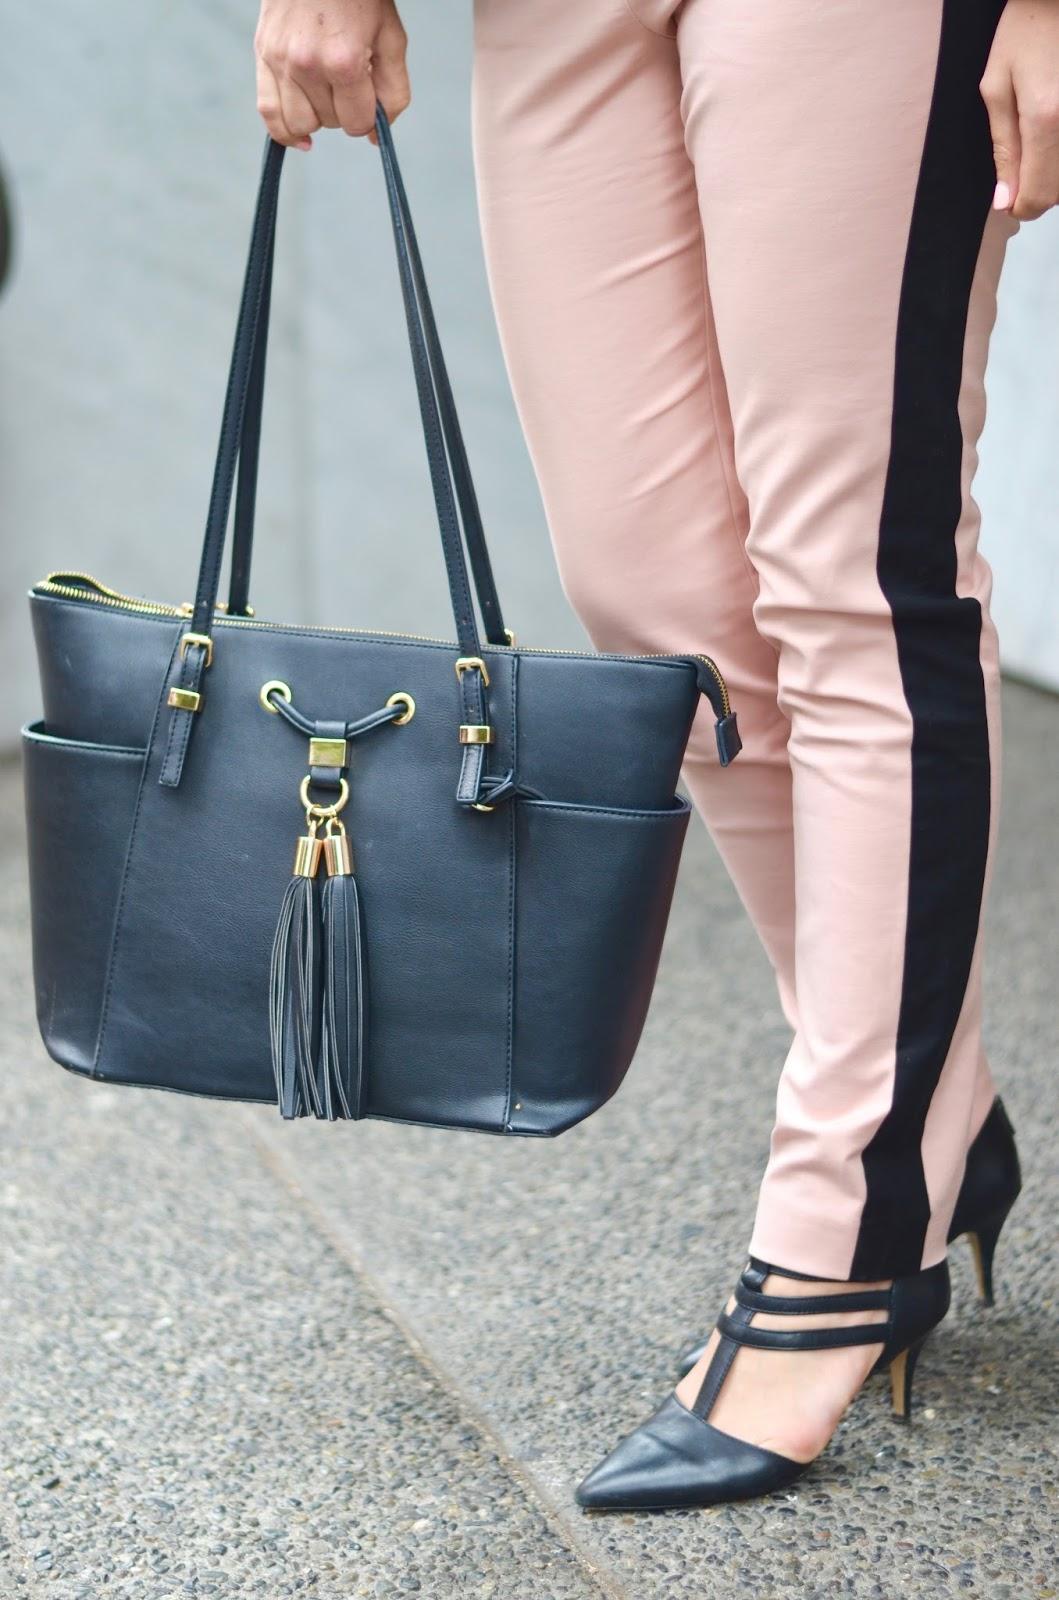 mallory high heels black